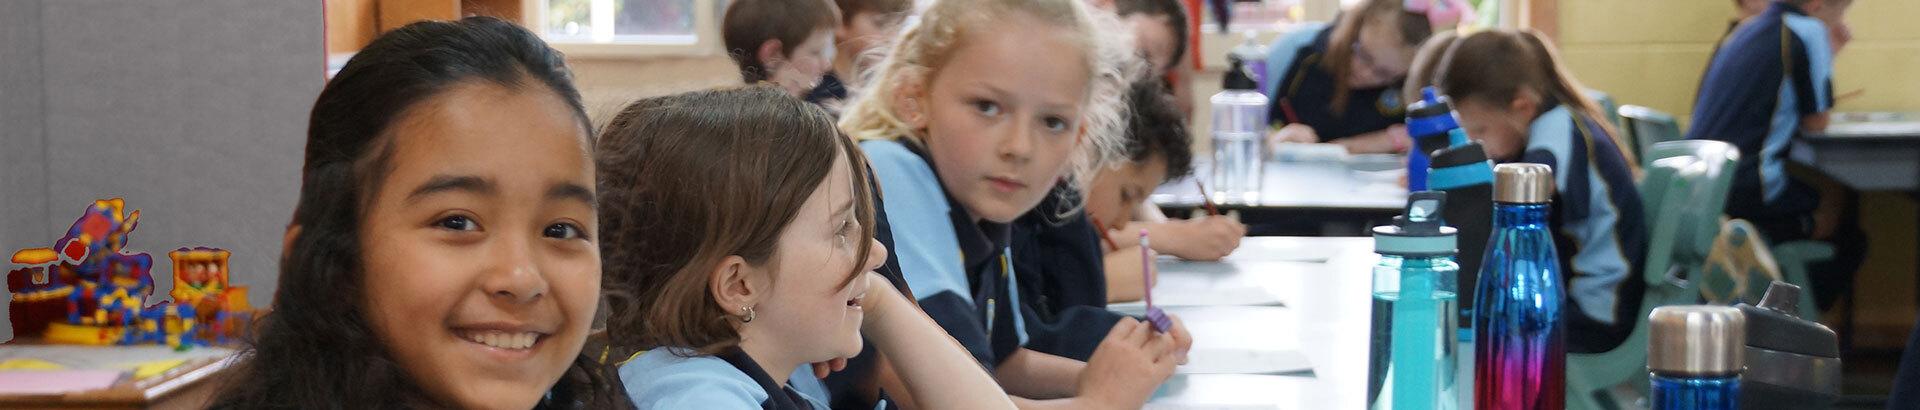 School Slider Image Four